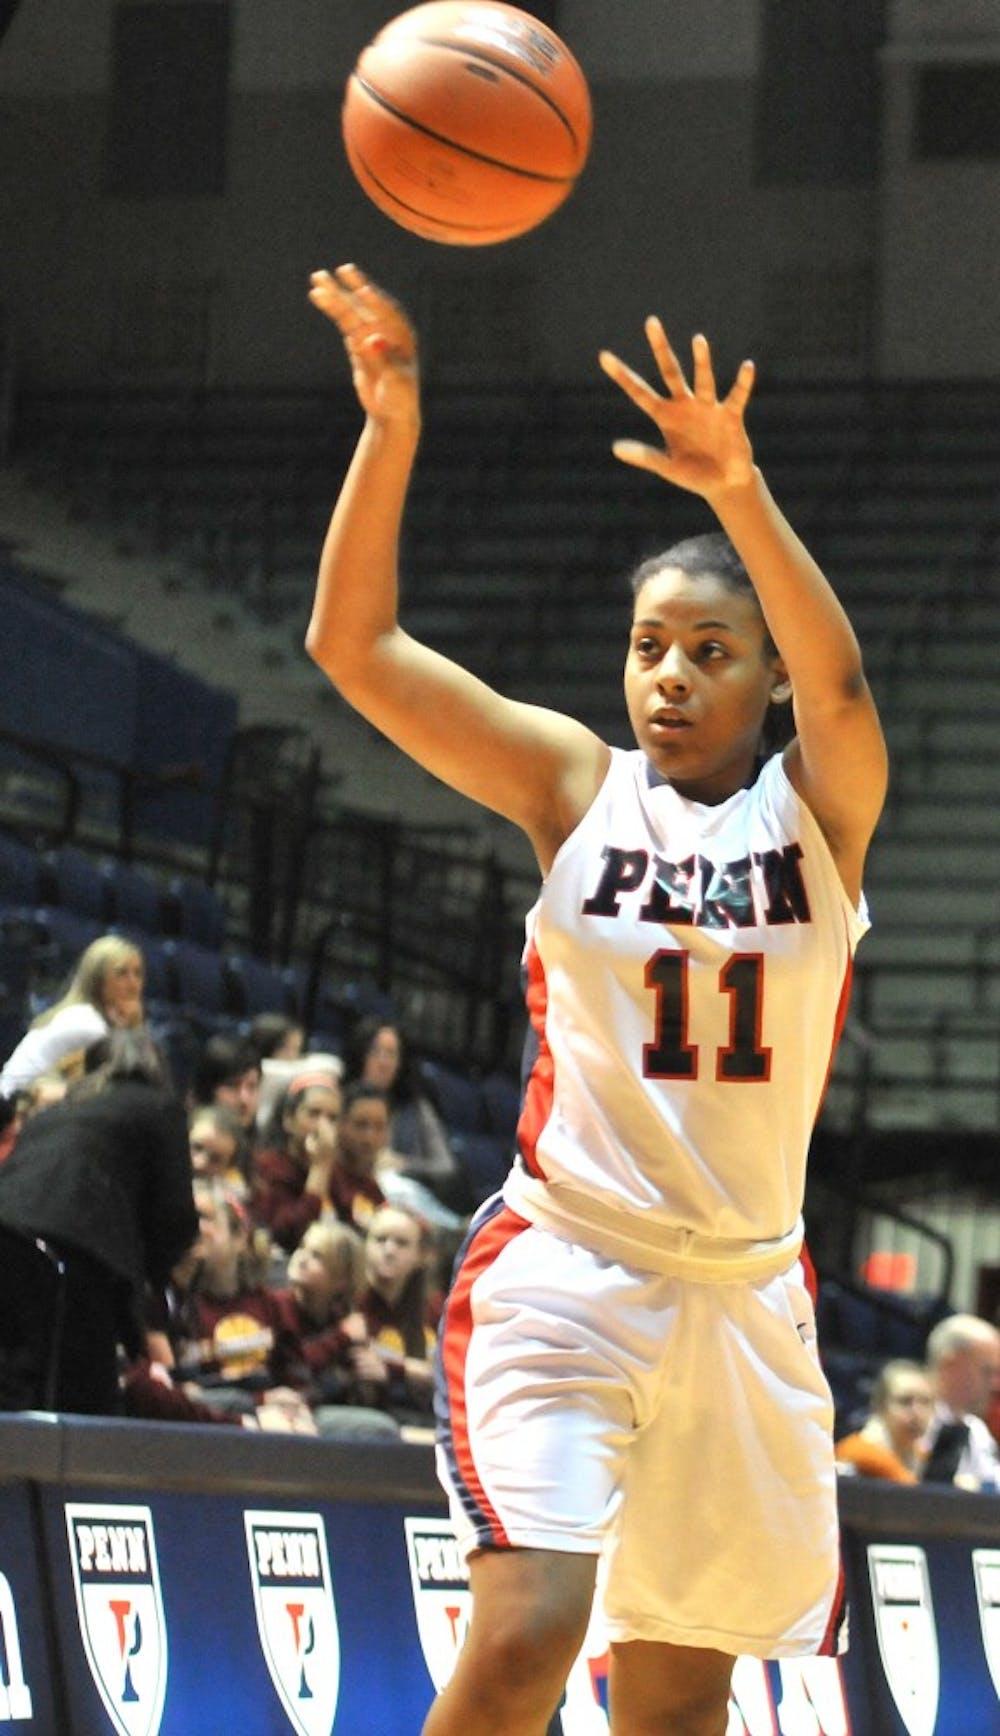 Penn Women's Basketball vs LIU